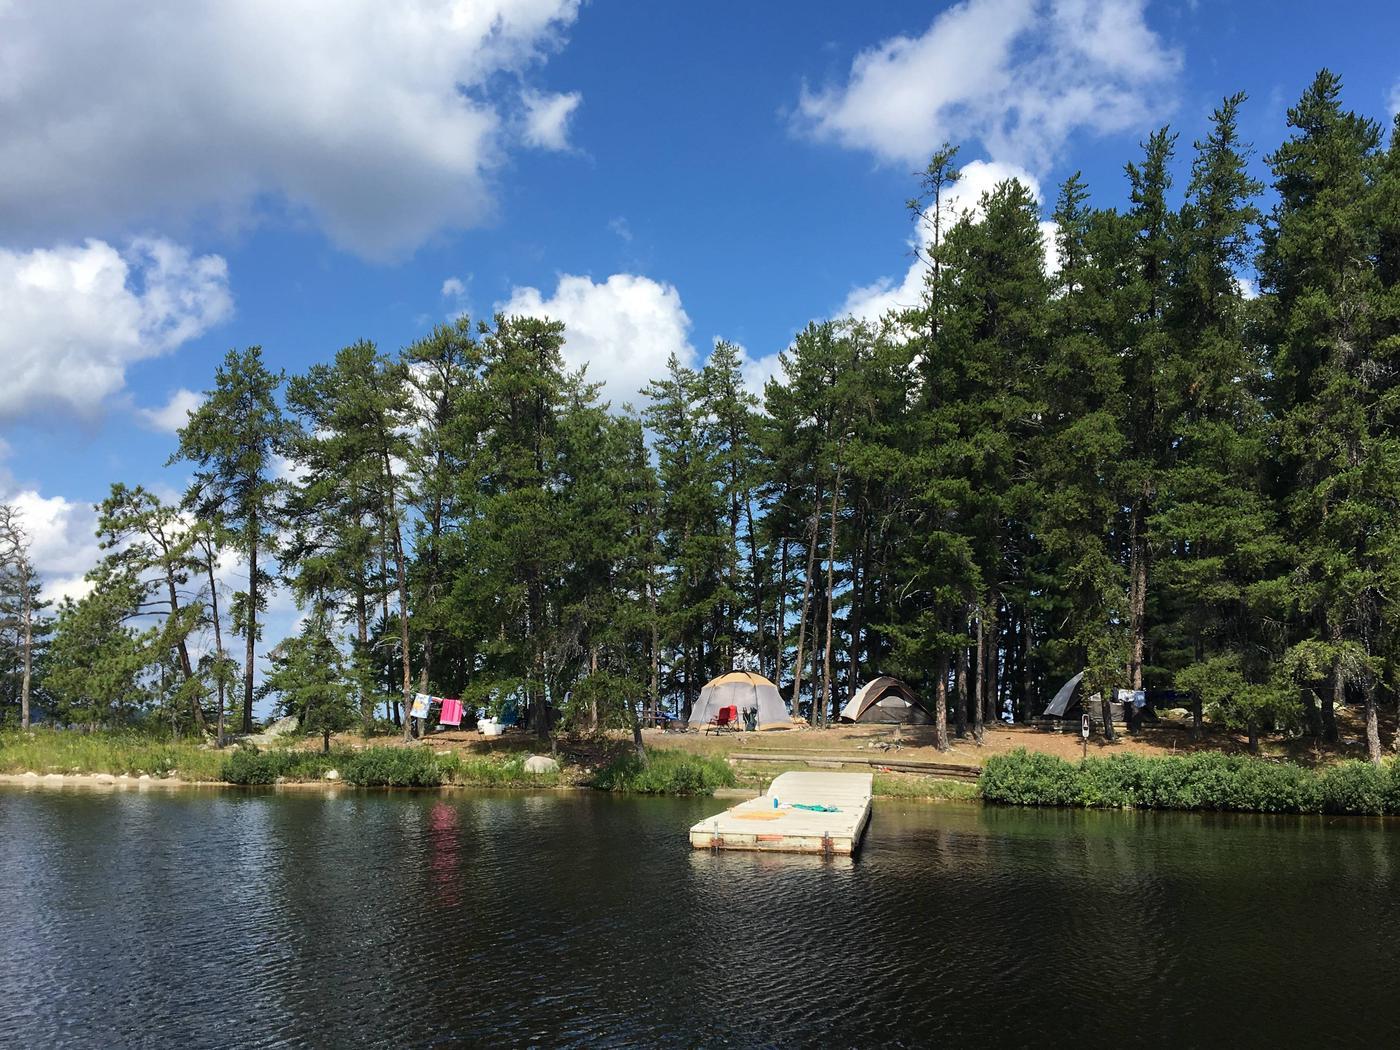 Campsite on Rainy LakeVirgin Is South Campsite